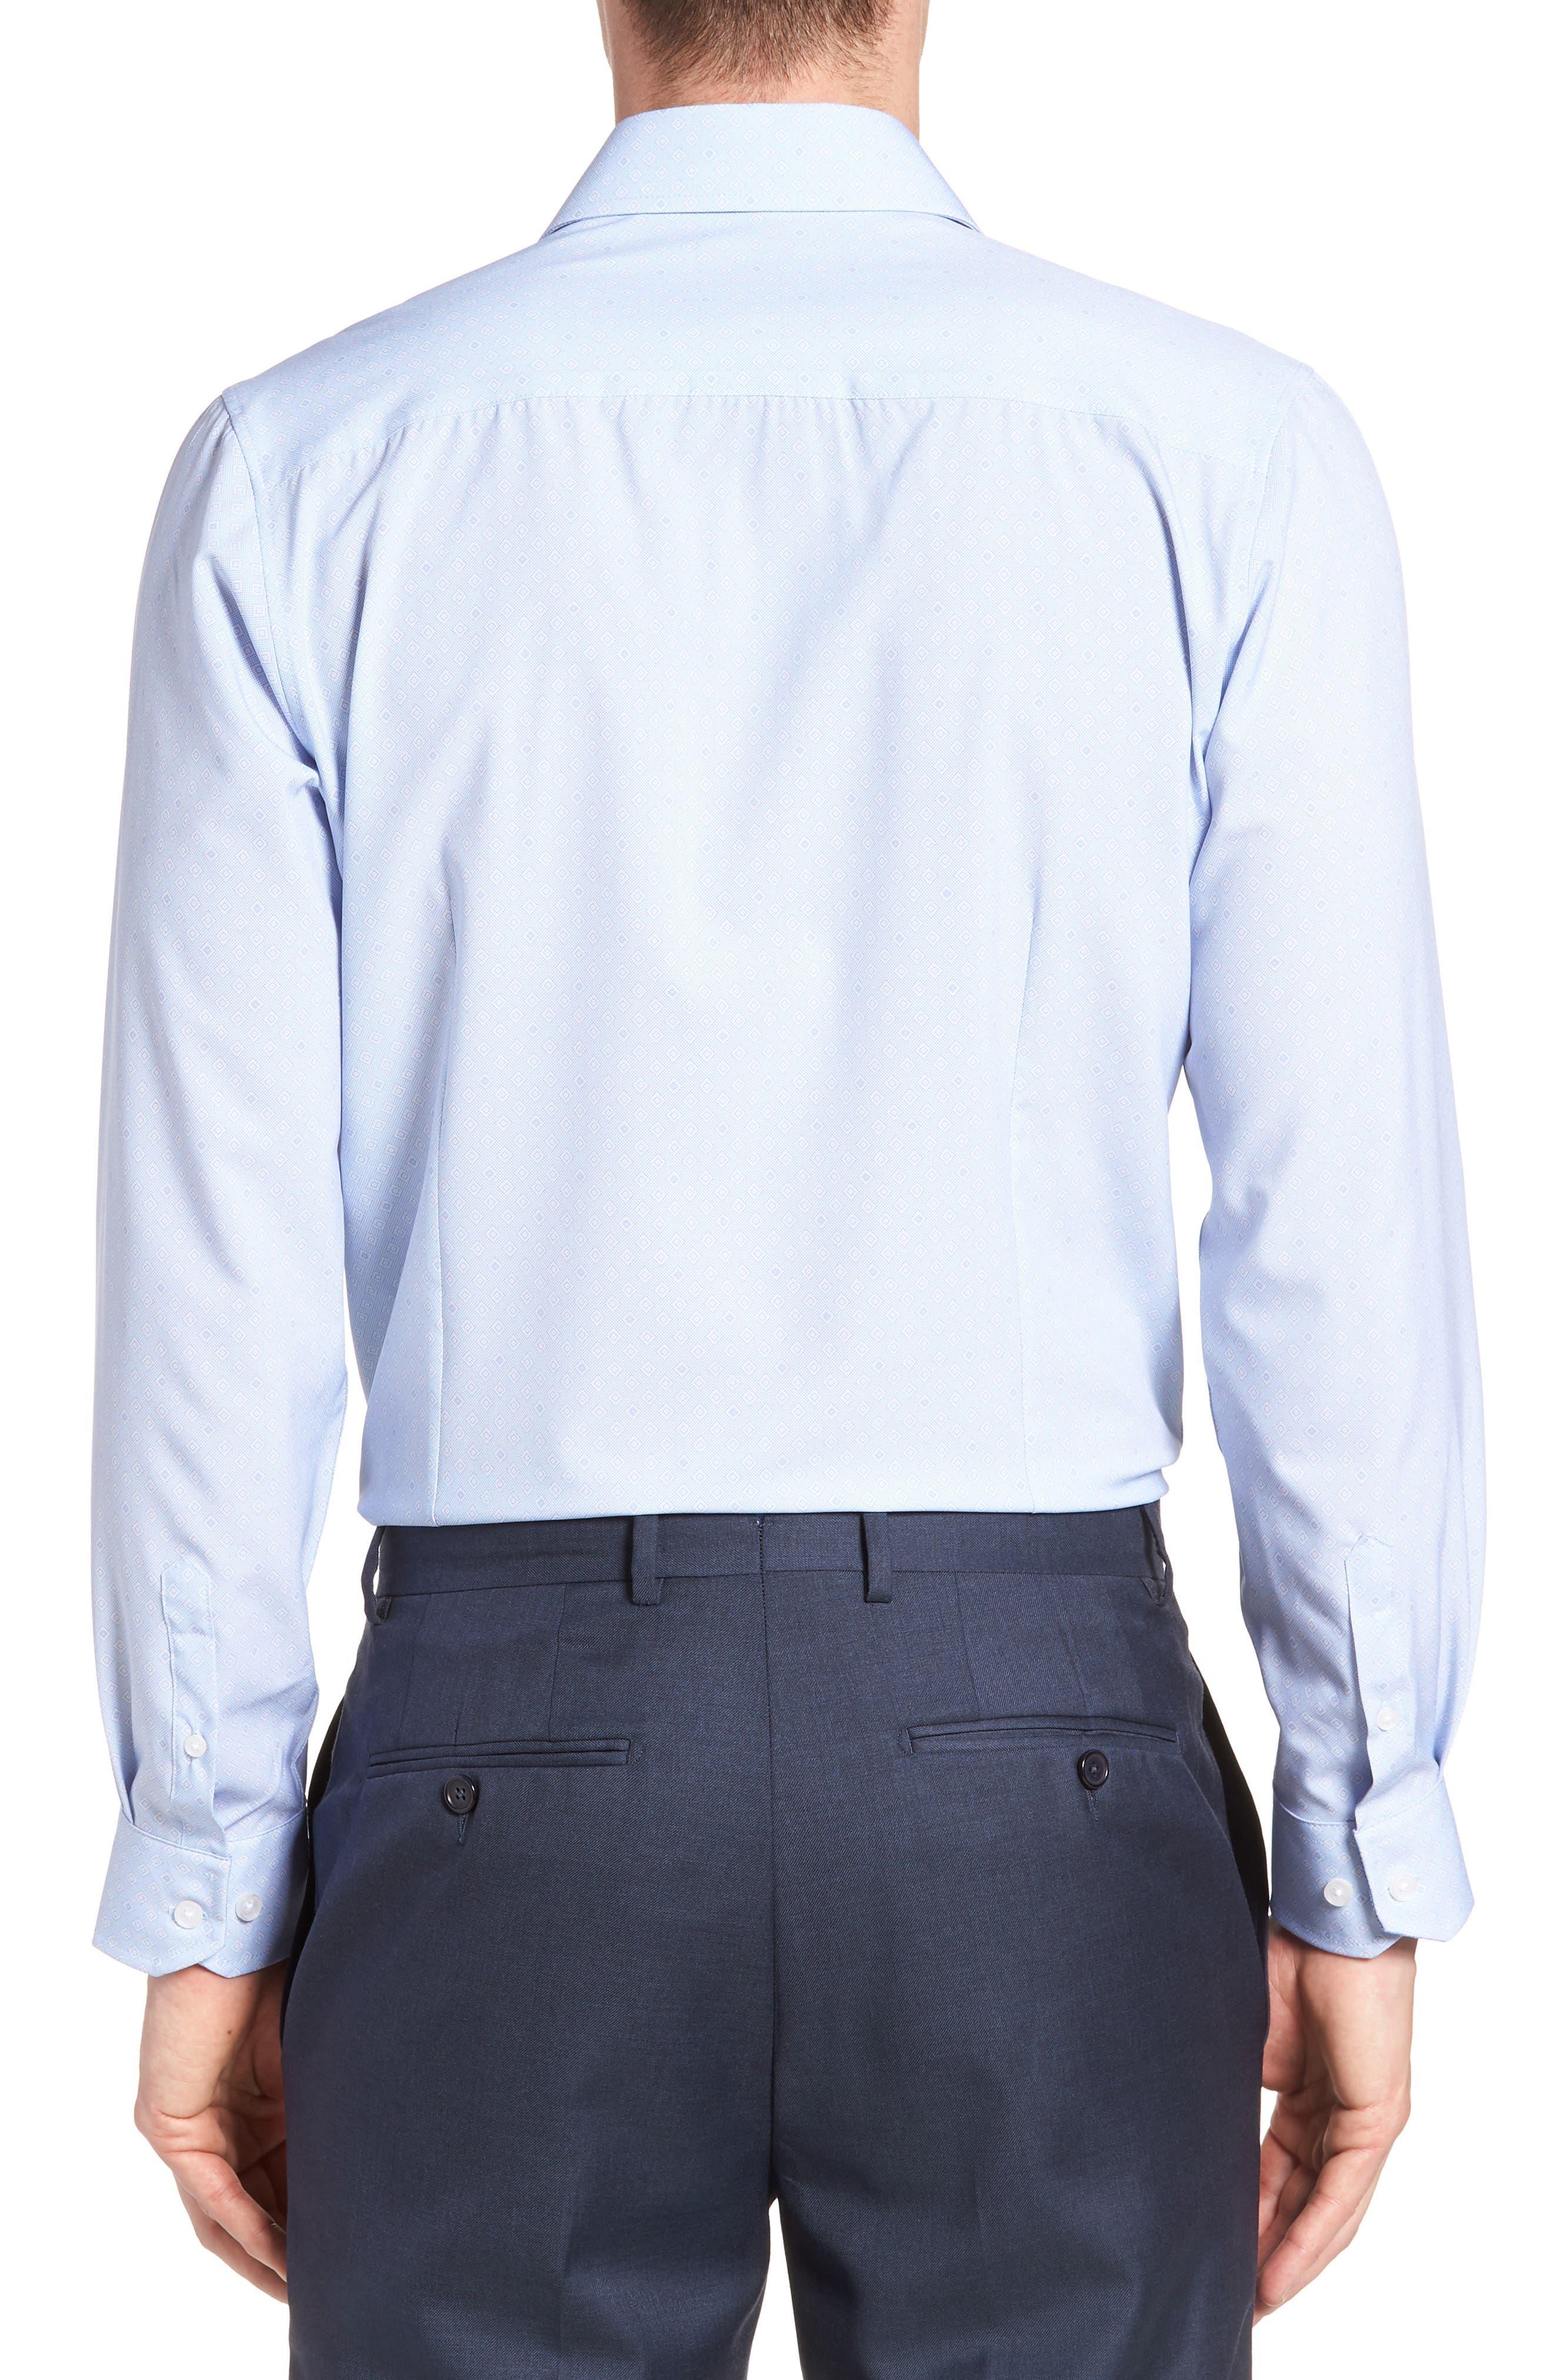 Trim Fit Geometric 4-Way Stretch Dress Shirt,                             Alternate thumbnail 3, color,                             BLUE